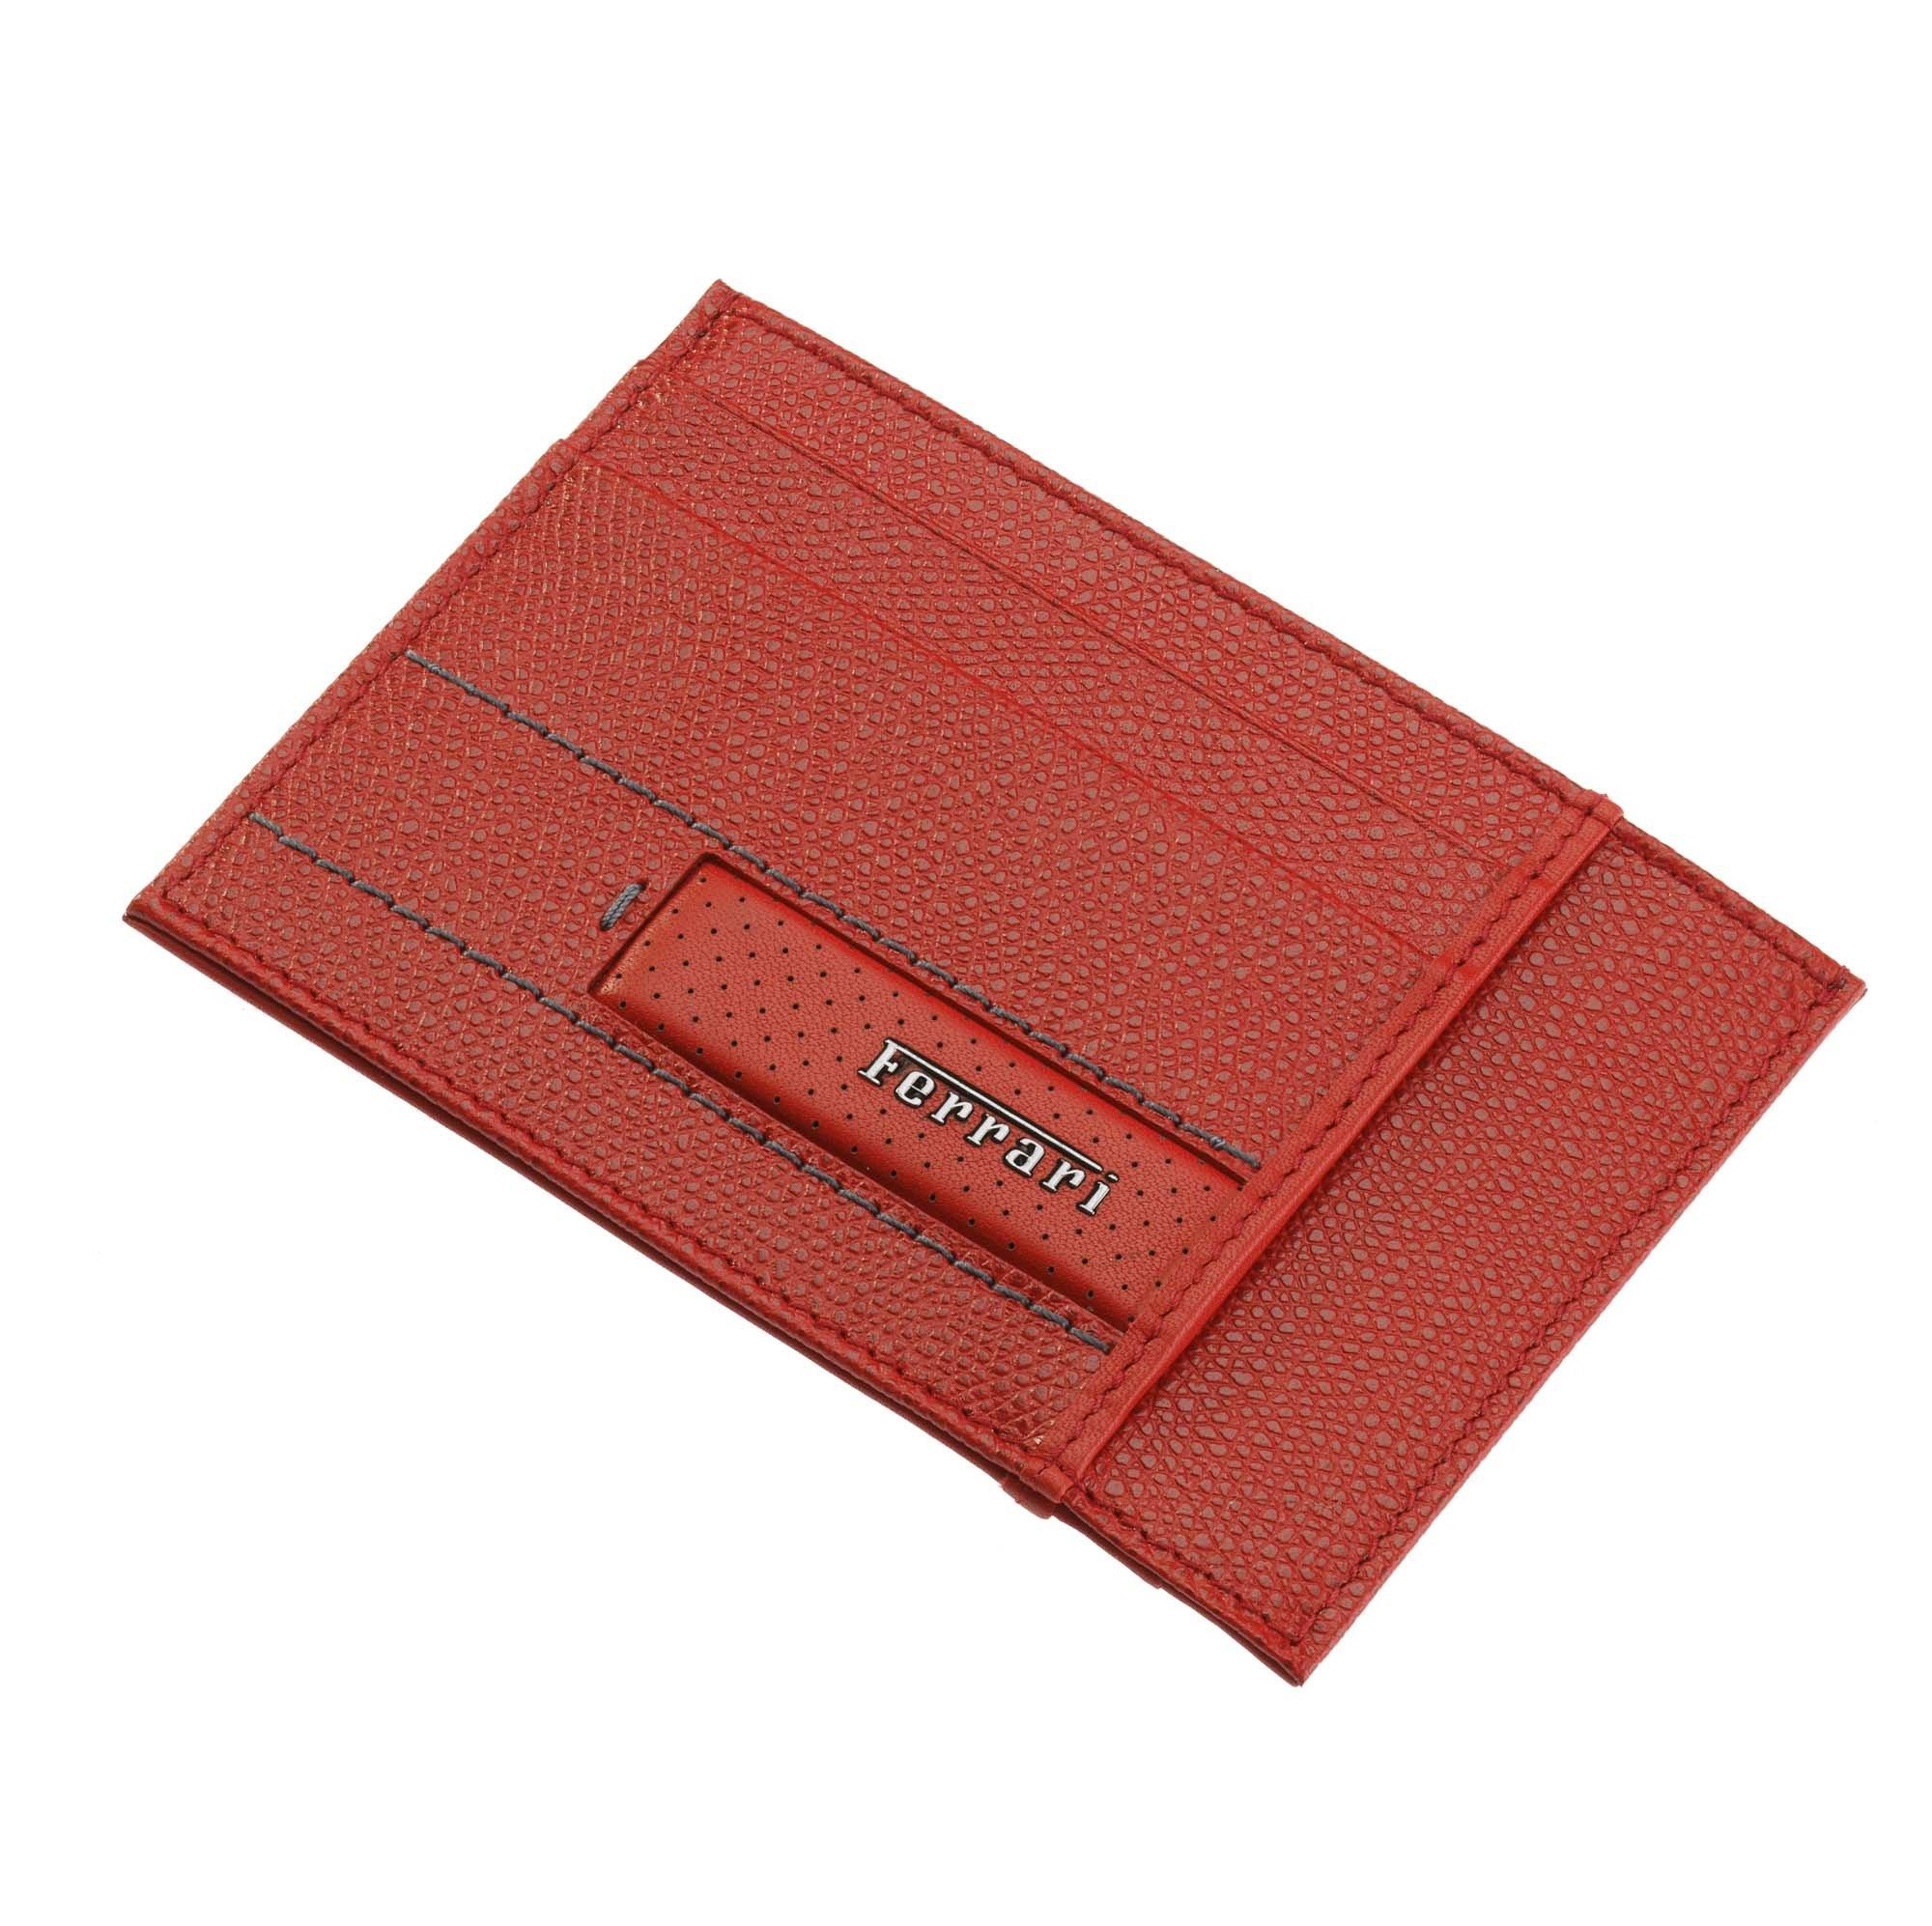 Men's Ferrari Cavallino Rampante Leather Wallet One size Dark Brown